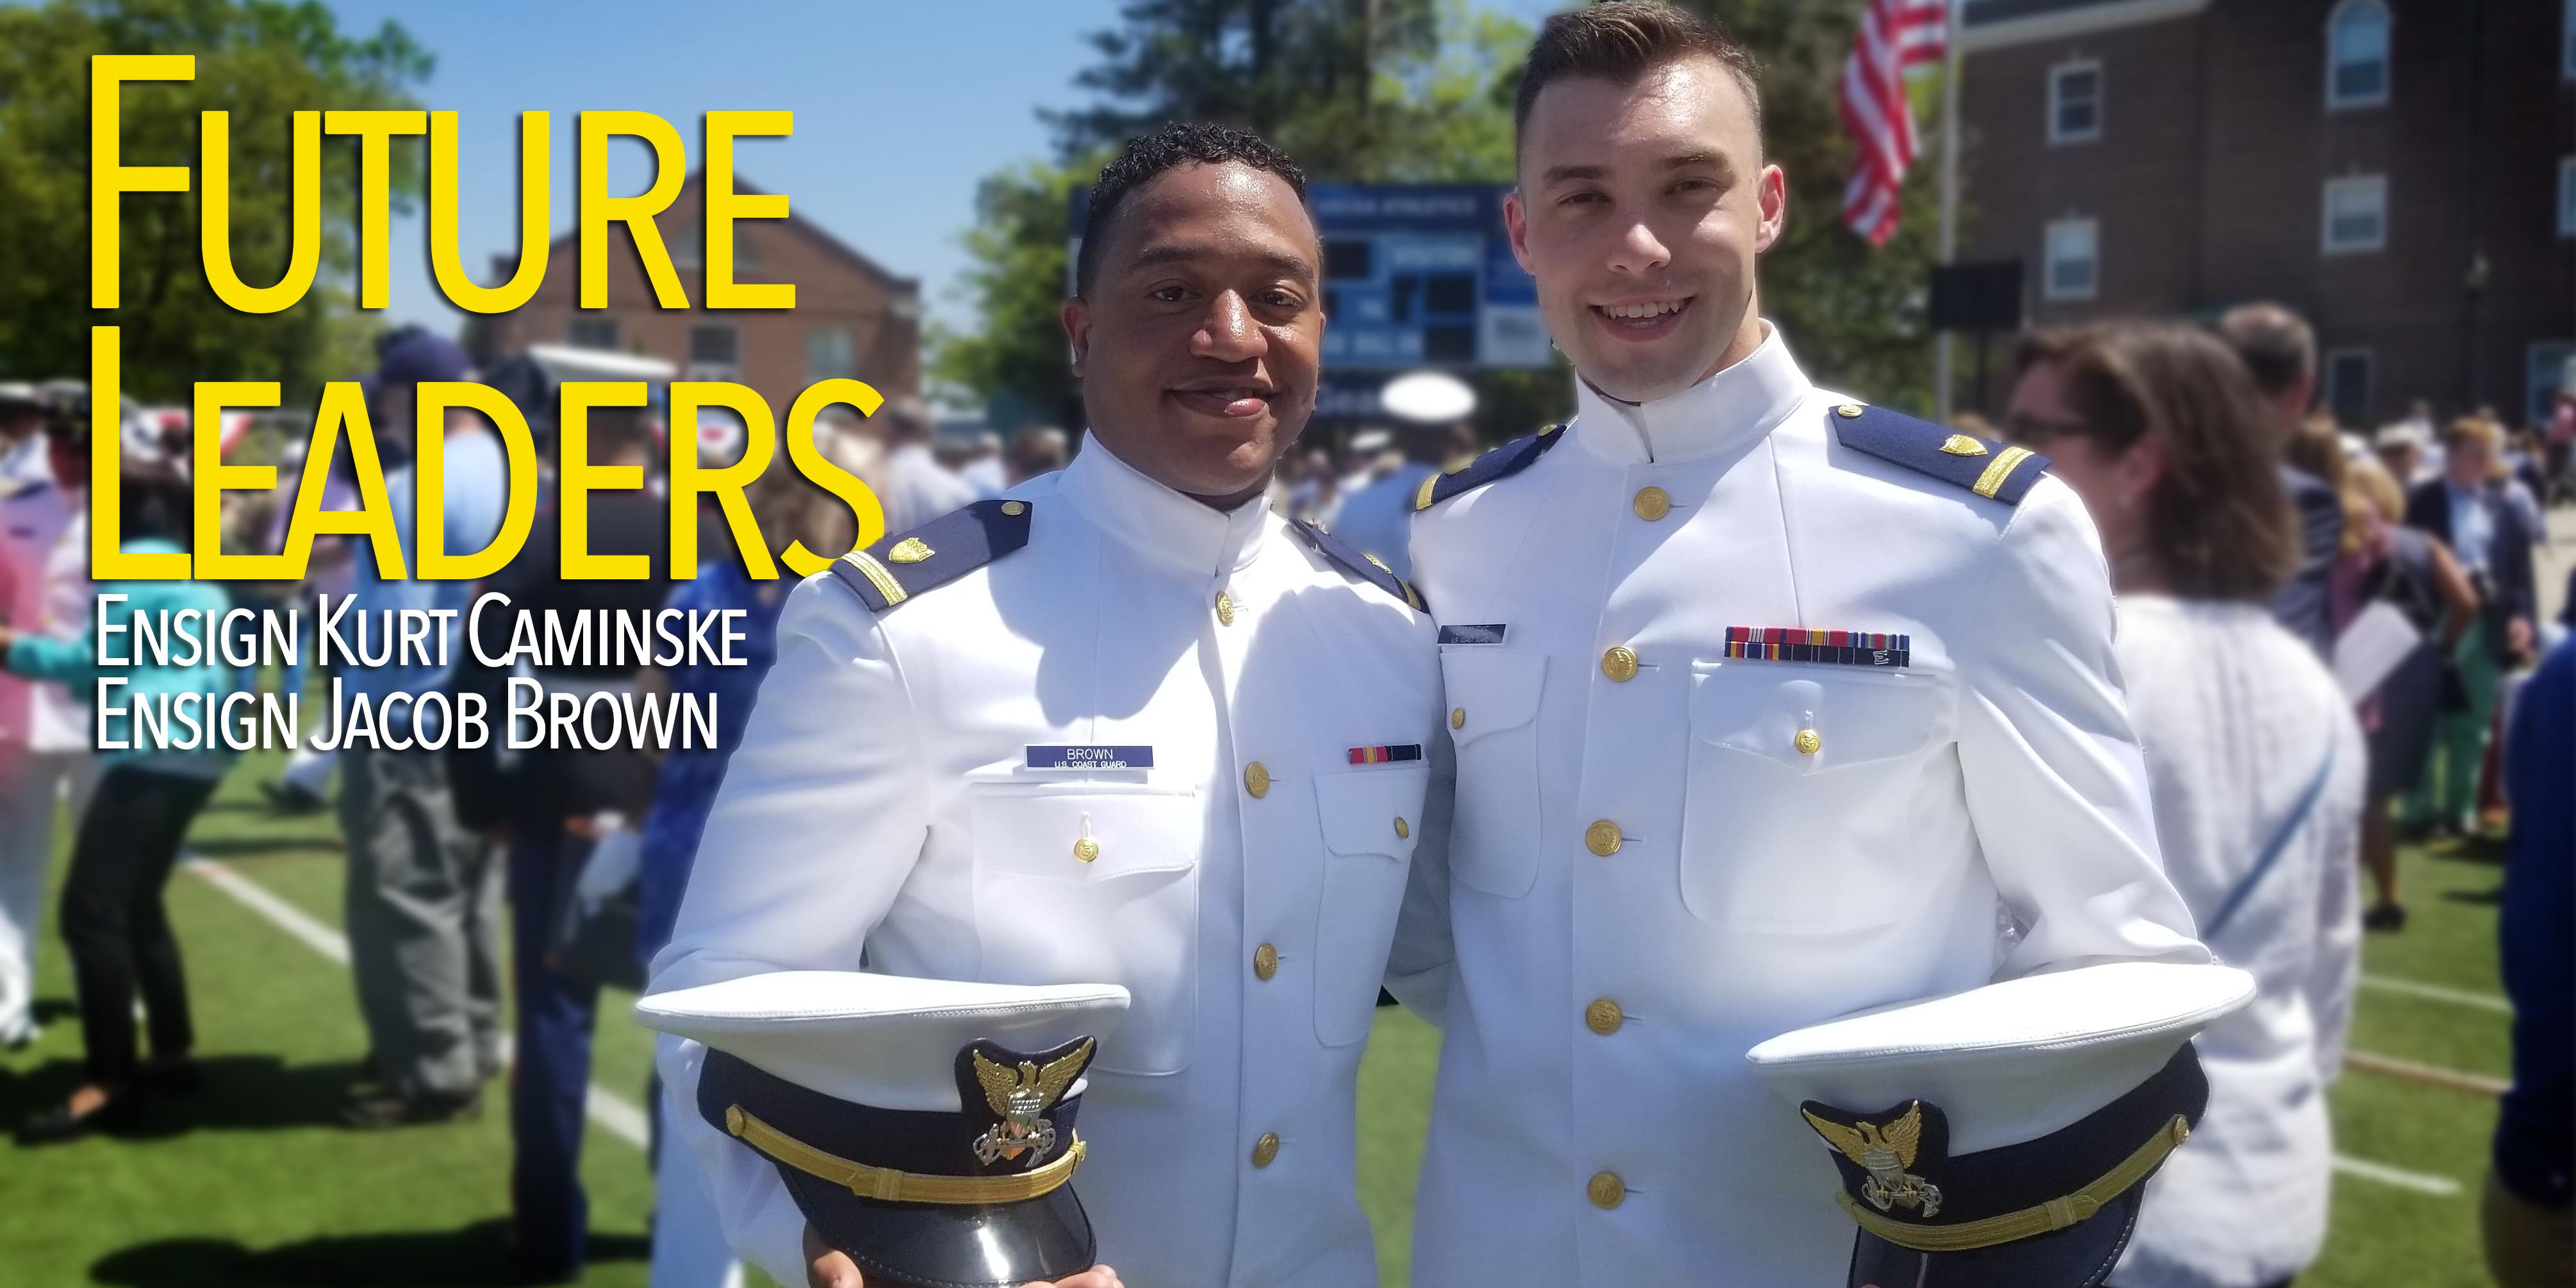 Future Leaders: Ensigns Kurt Caminske and Jacob Brown